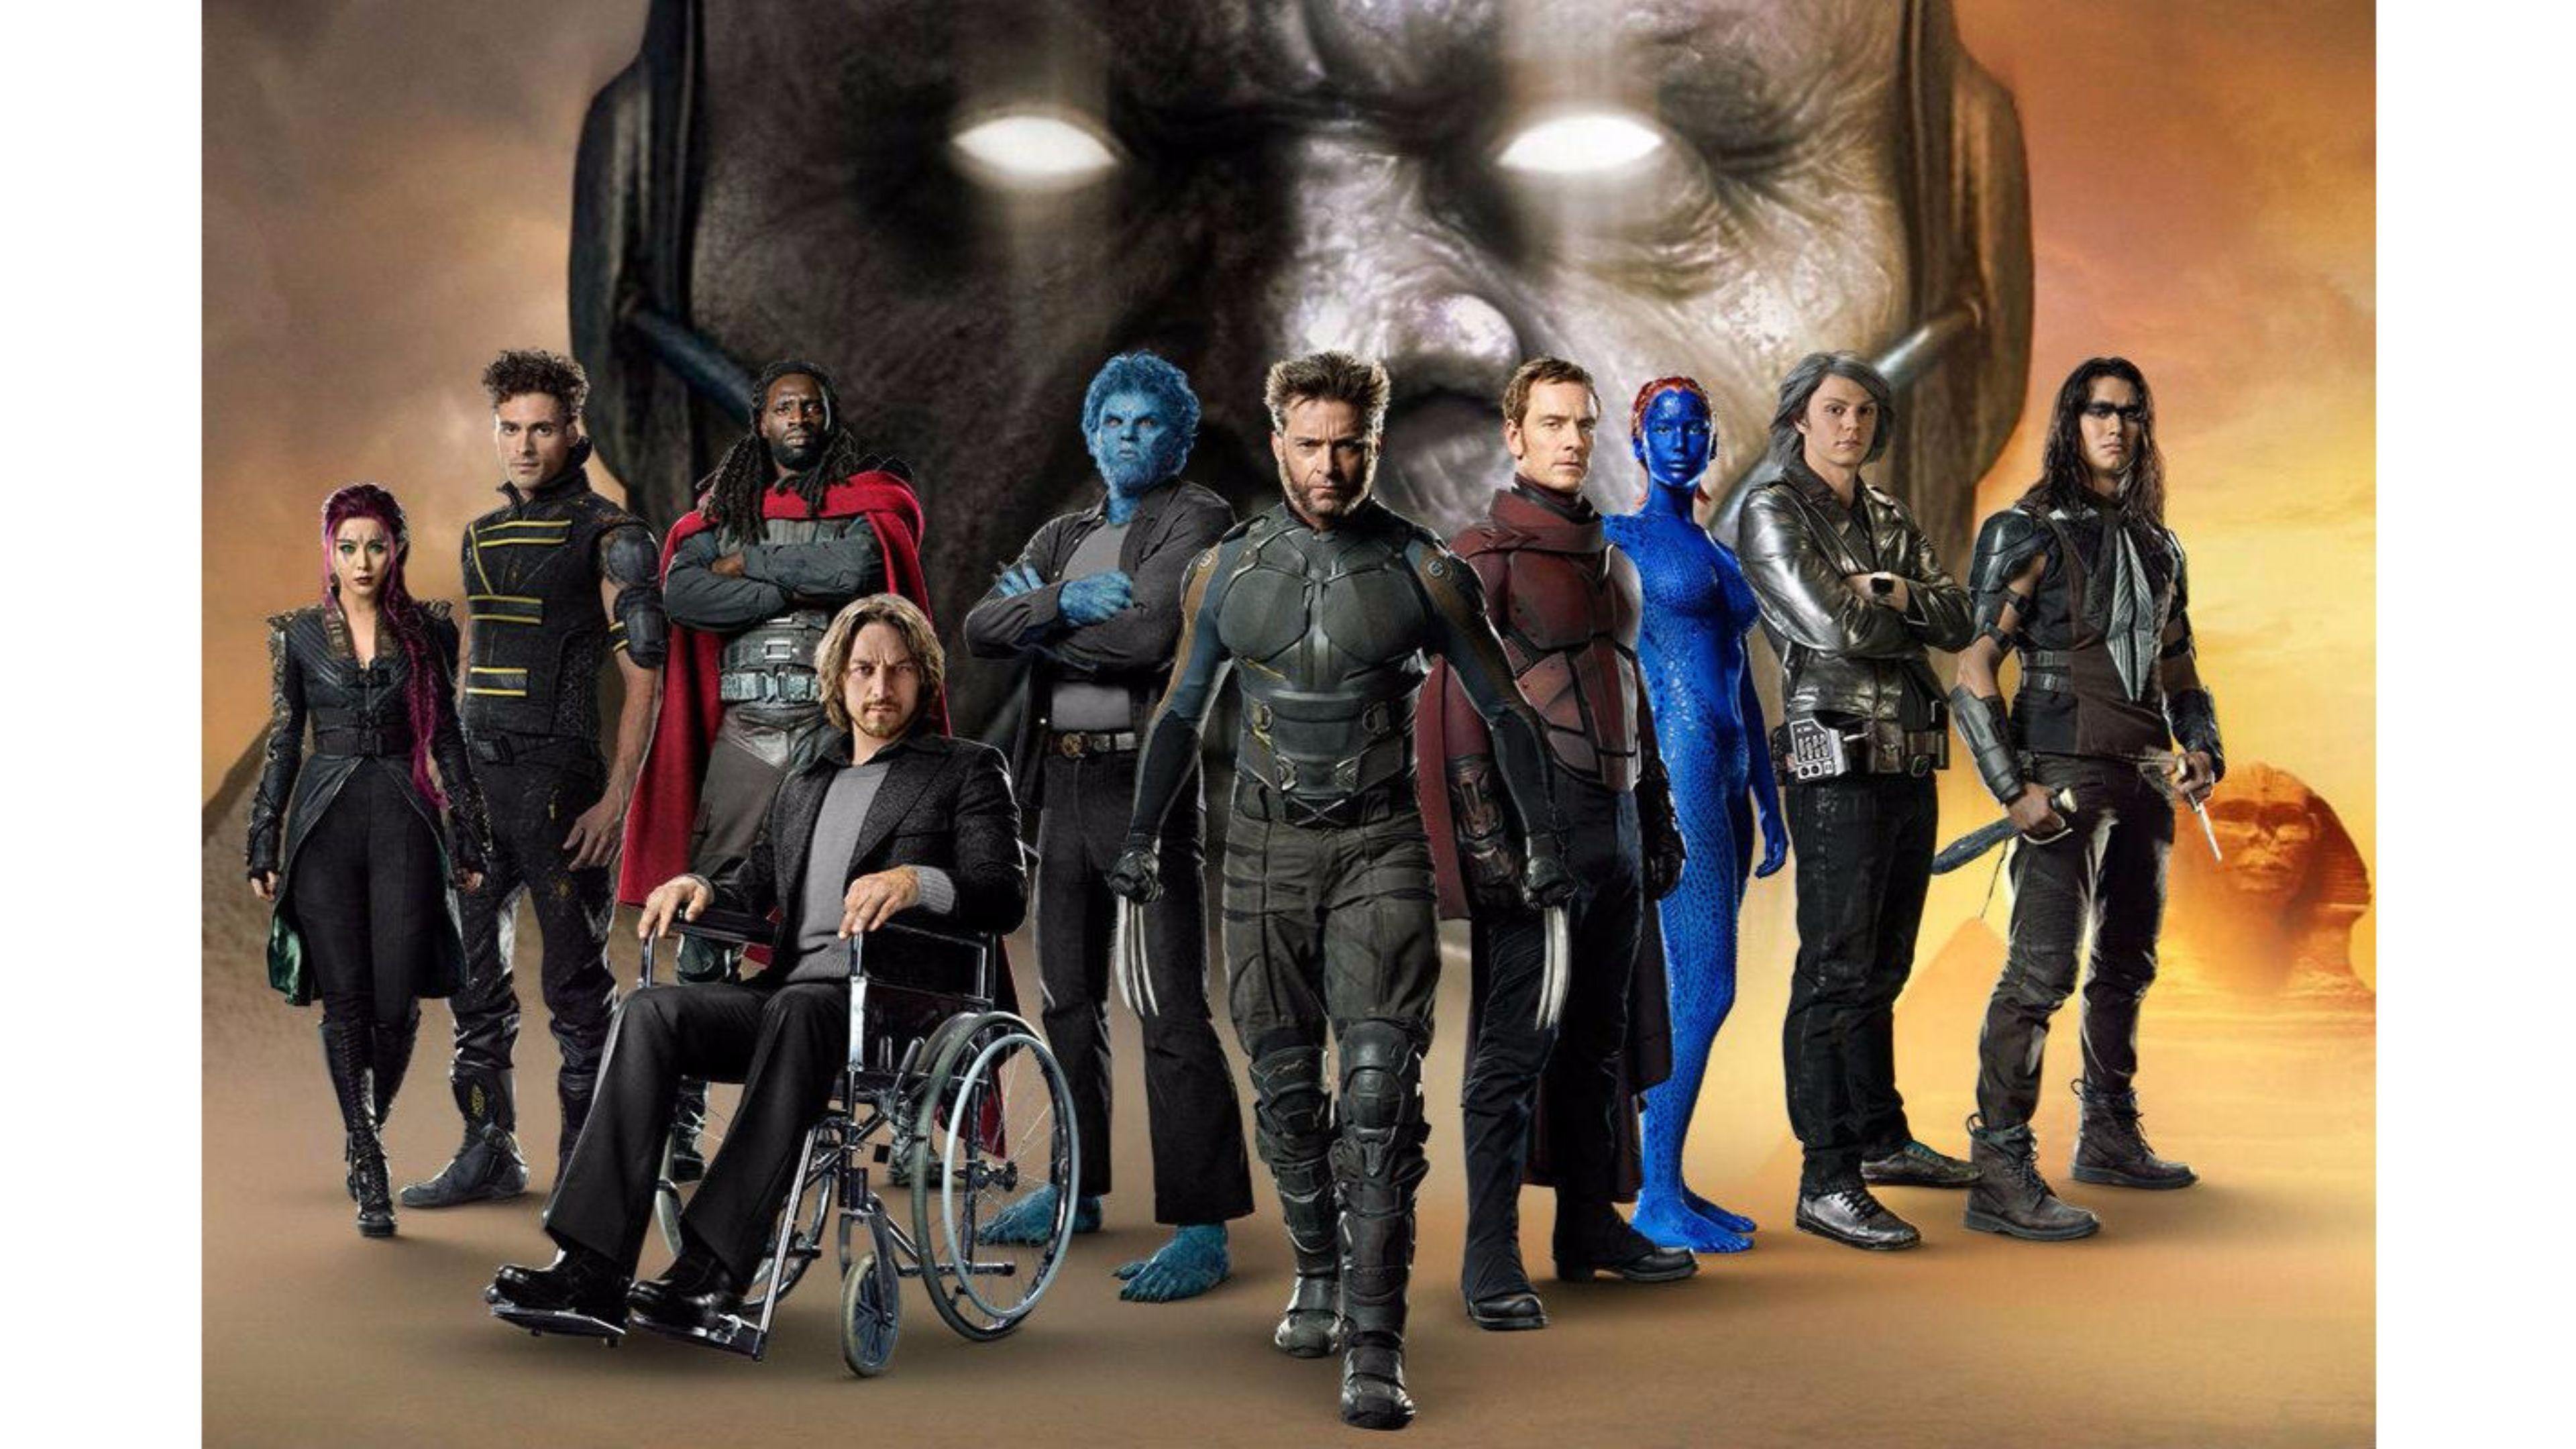 X Men Apocalypse Wallpapers Wallpapertag